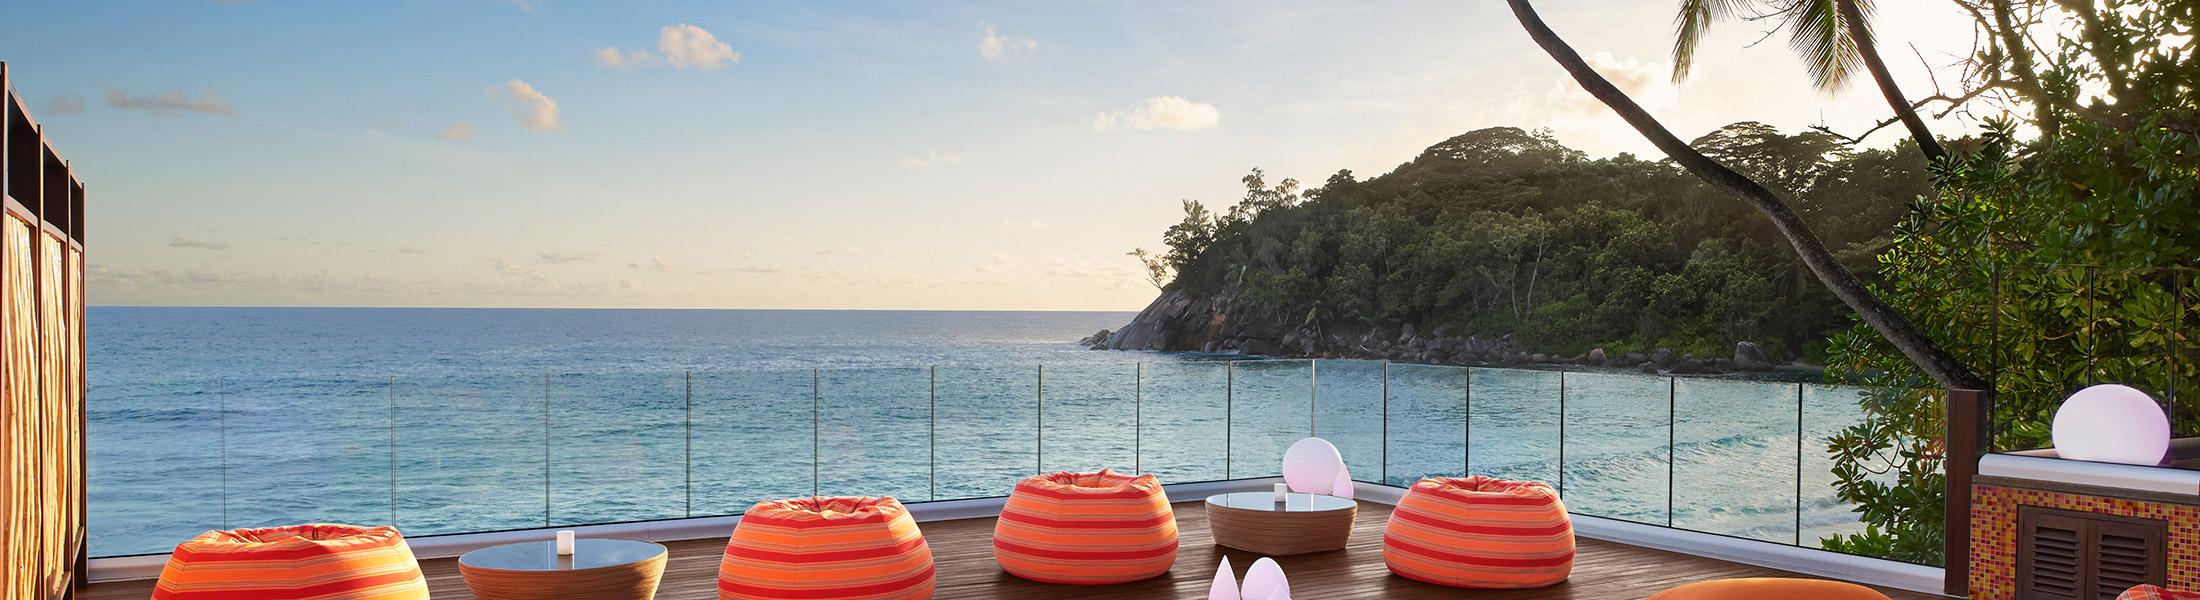 Gravity Bar overlooking the Indian Ocean at AVANI Barbarons Seychelles